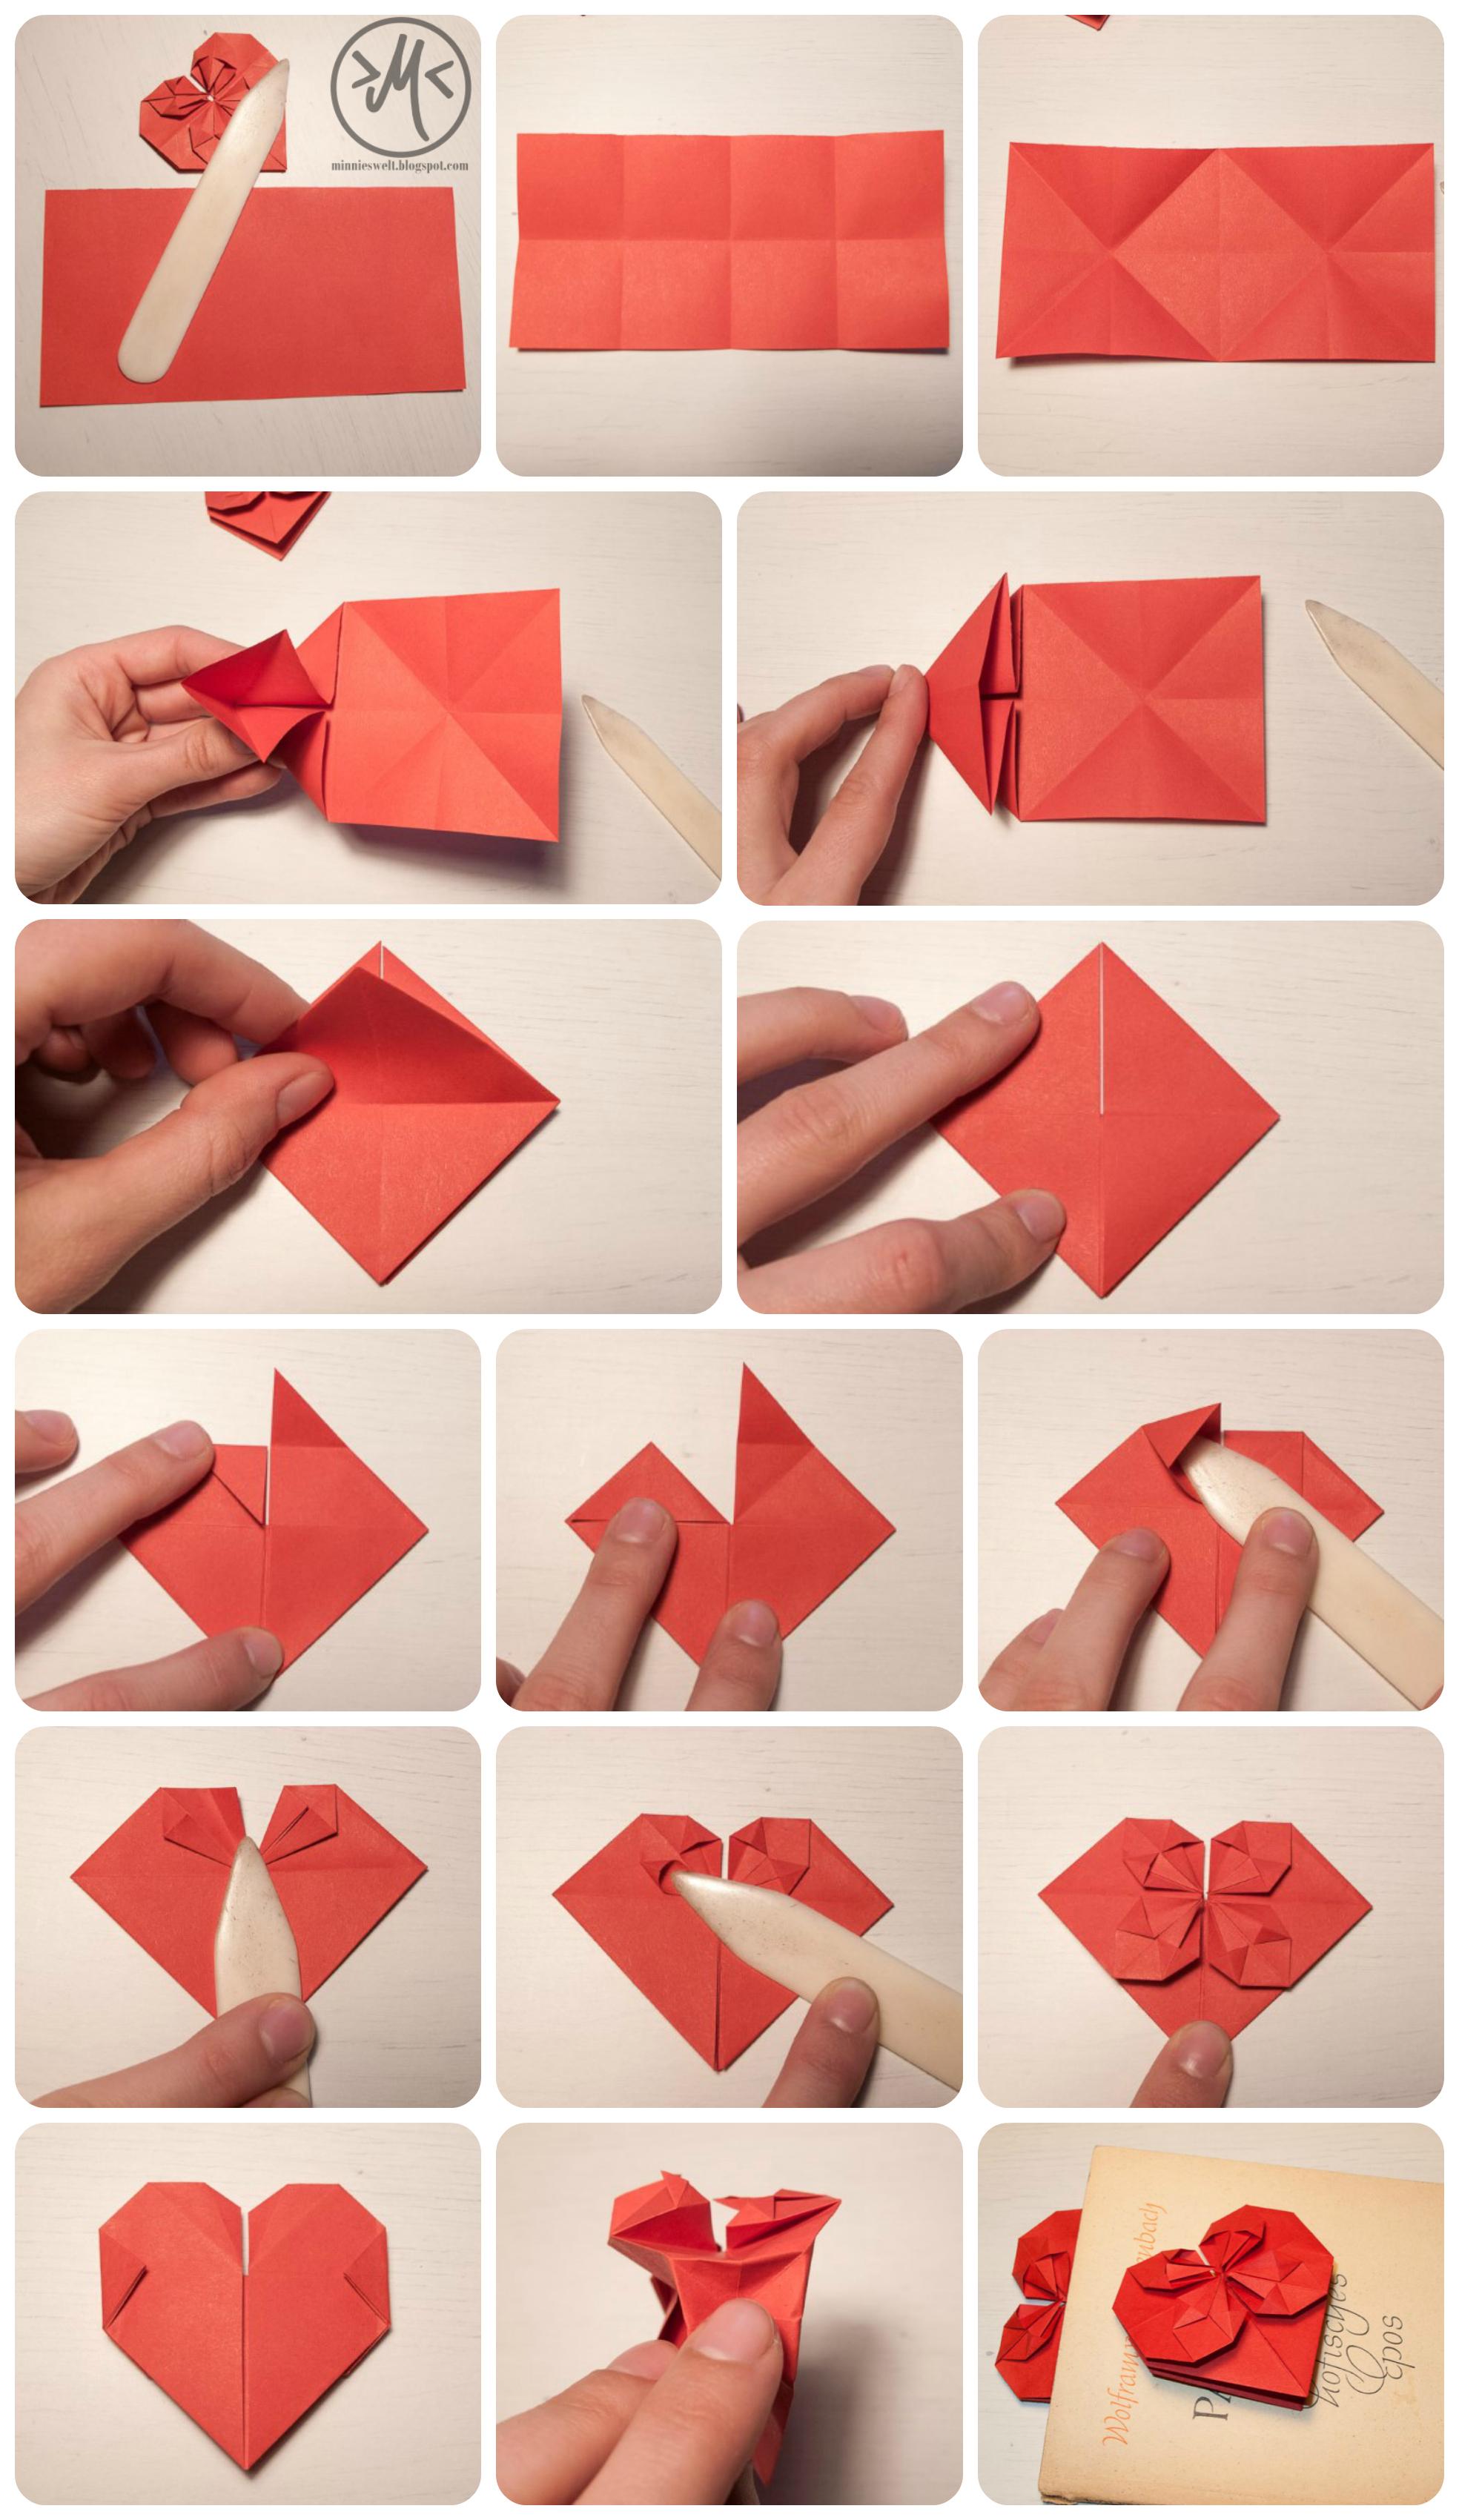 00 493x700 198kb Handmade Origami Origami Bow и Origami Easy